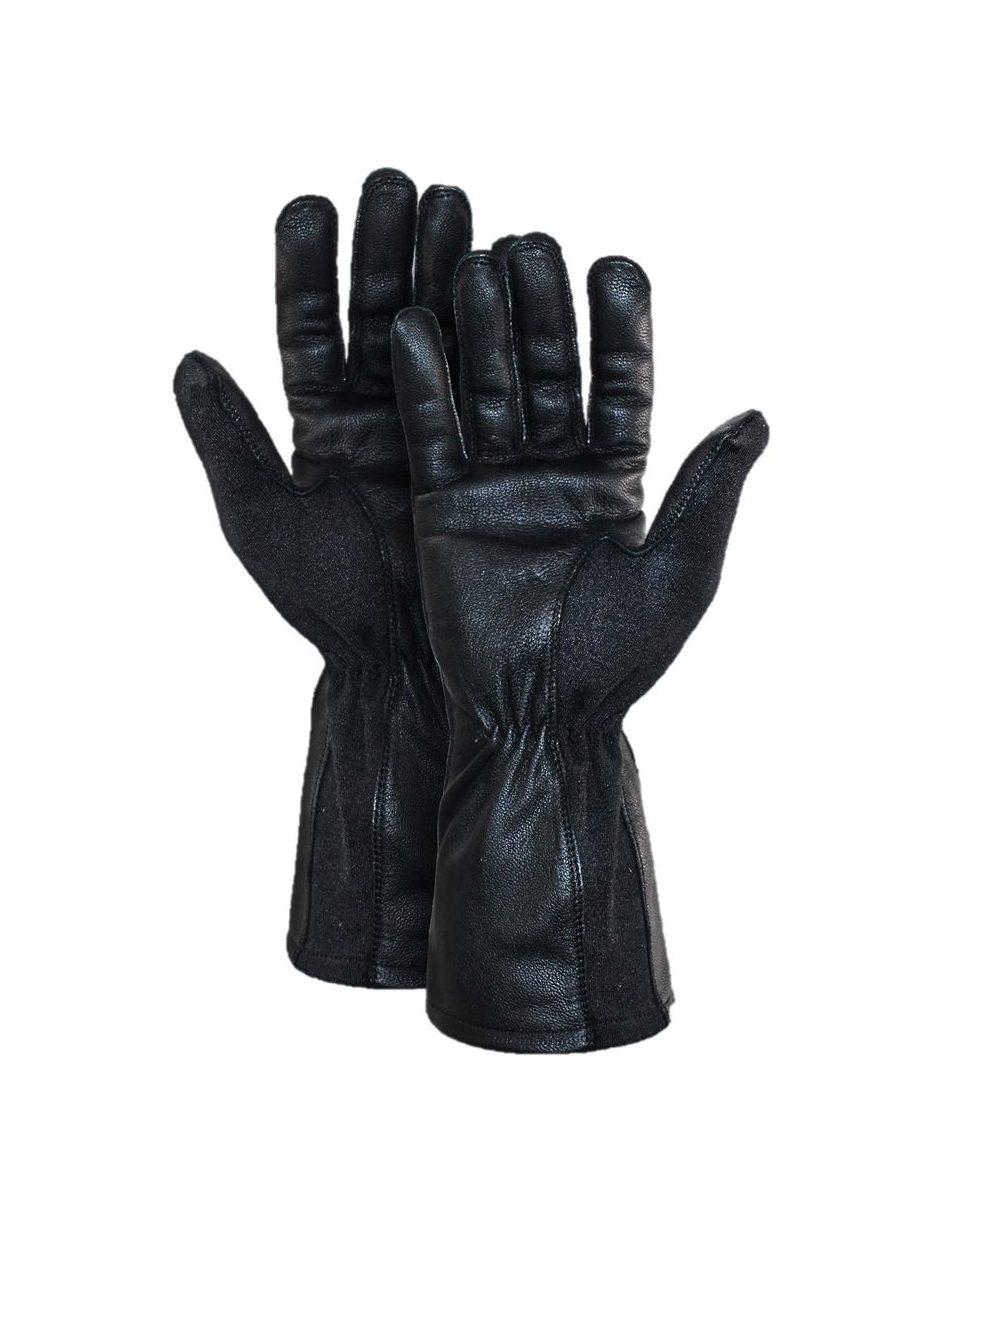 Nomex Touchscreen Flight Gloves